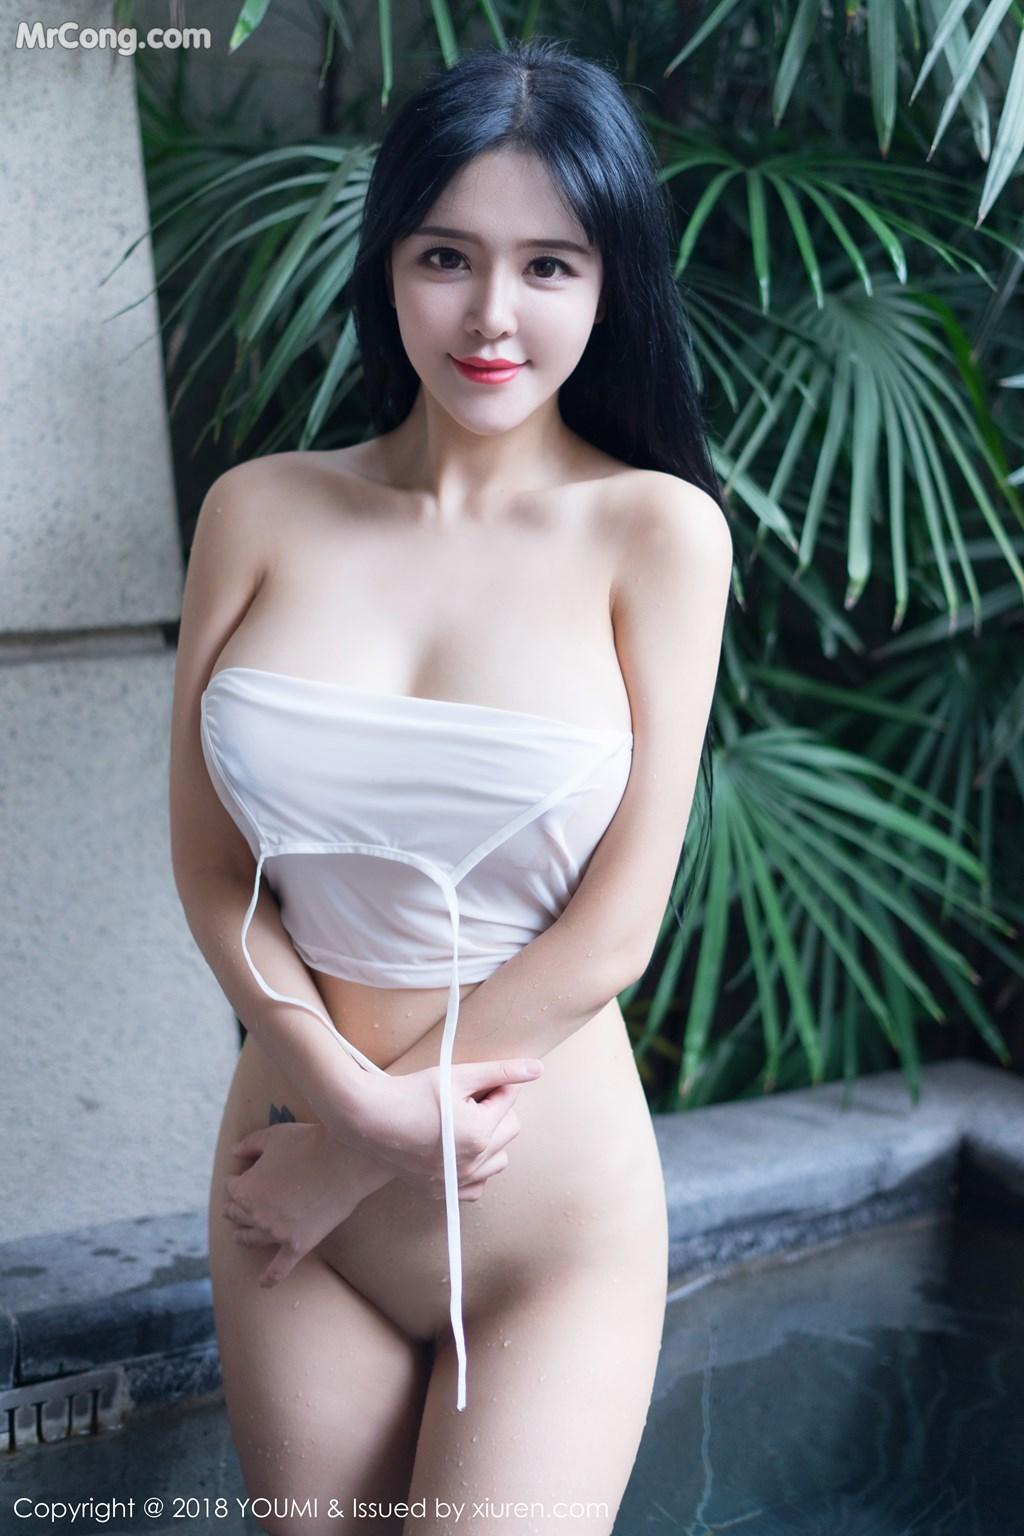 MiStar Vol.179: Model Liu Yu Er (刘 钰 儿) (41 photos)